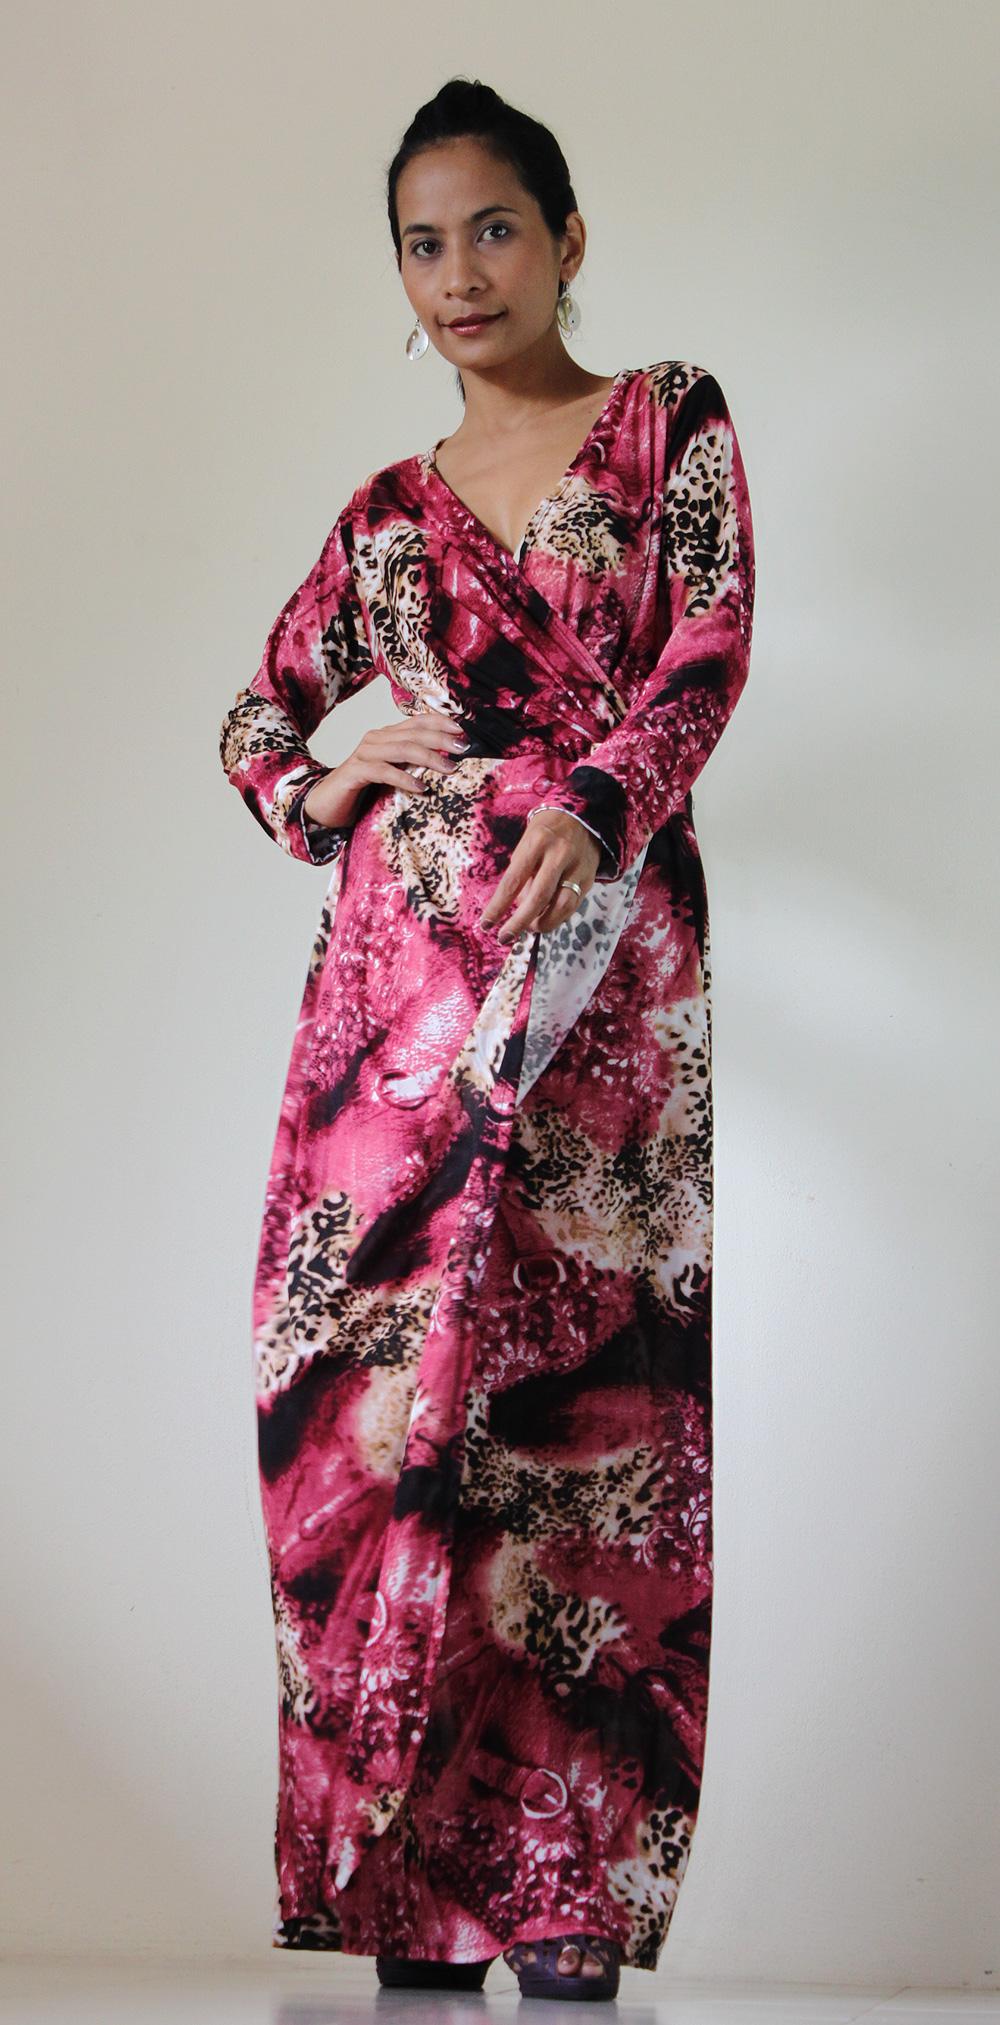 Long Sleeve Dress - Purple Print Evening Gown